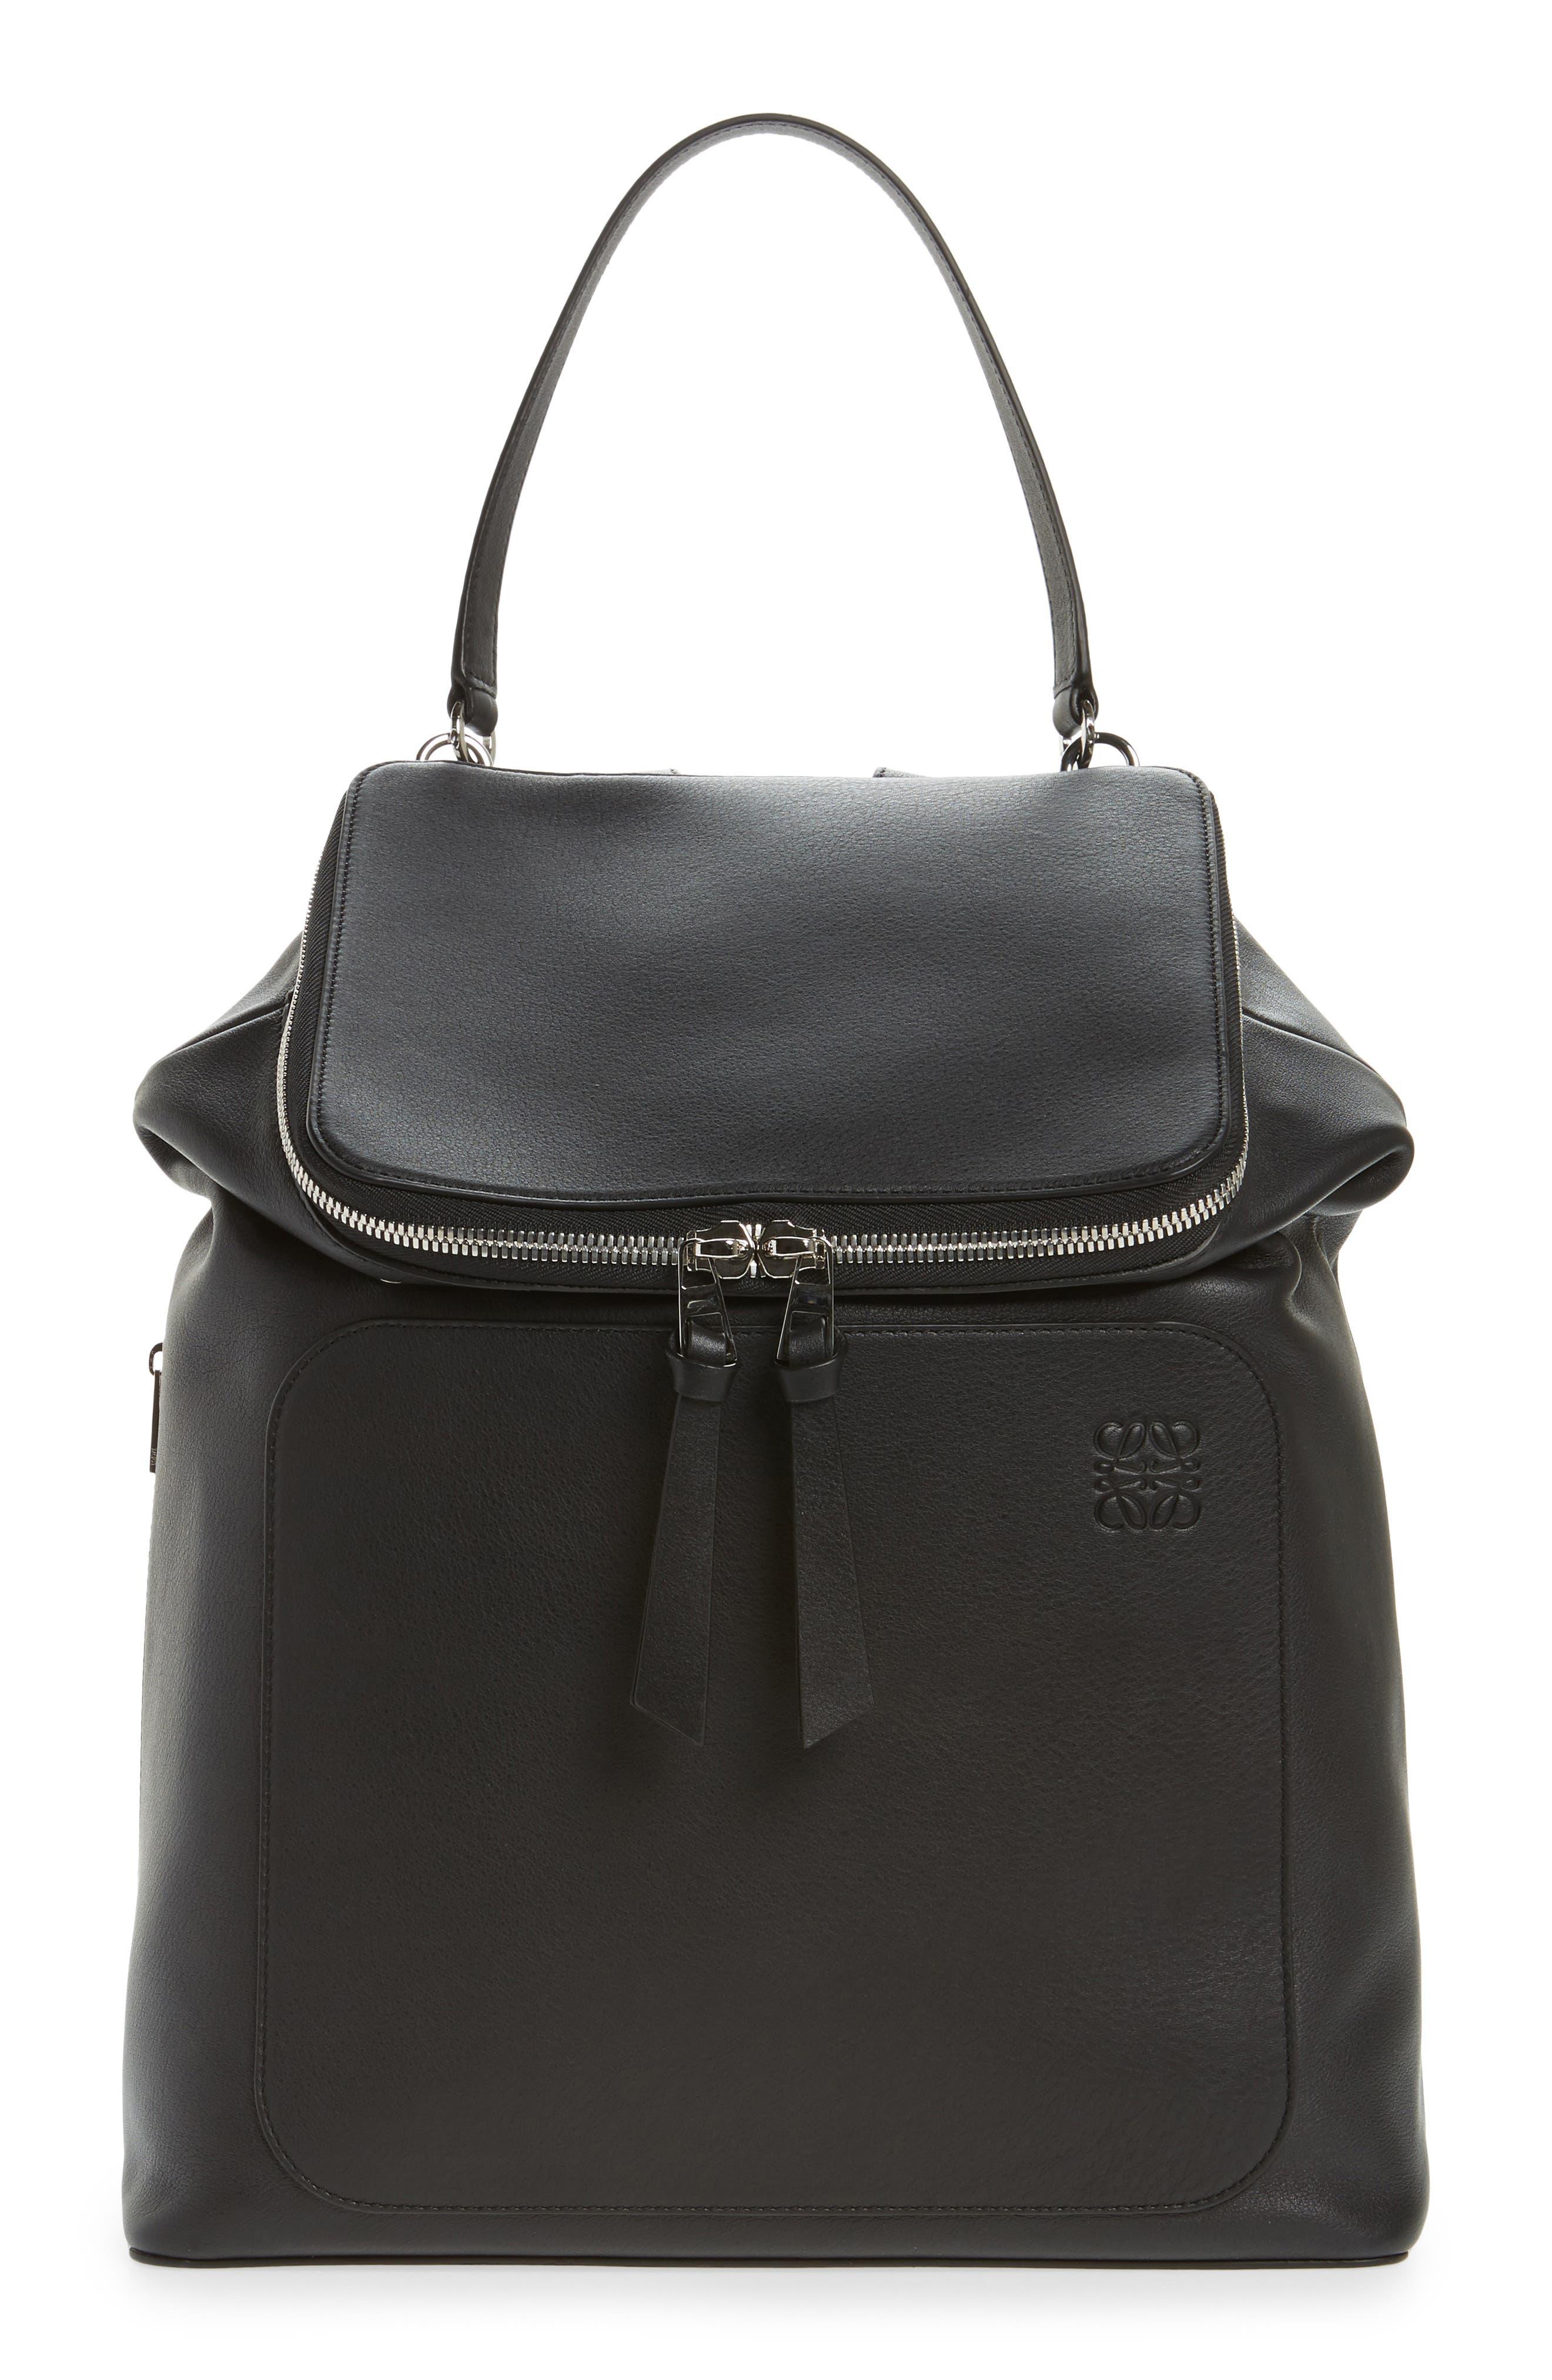 LOEWE, Goya Leather Backpack, Main thumbnail 1, color, BLACK